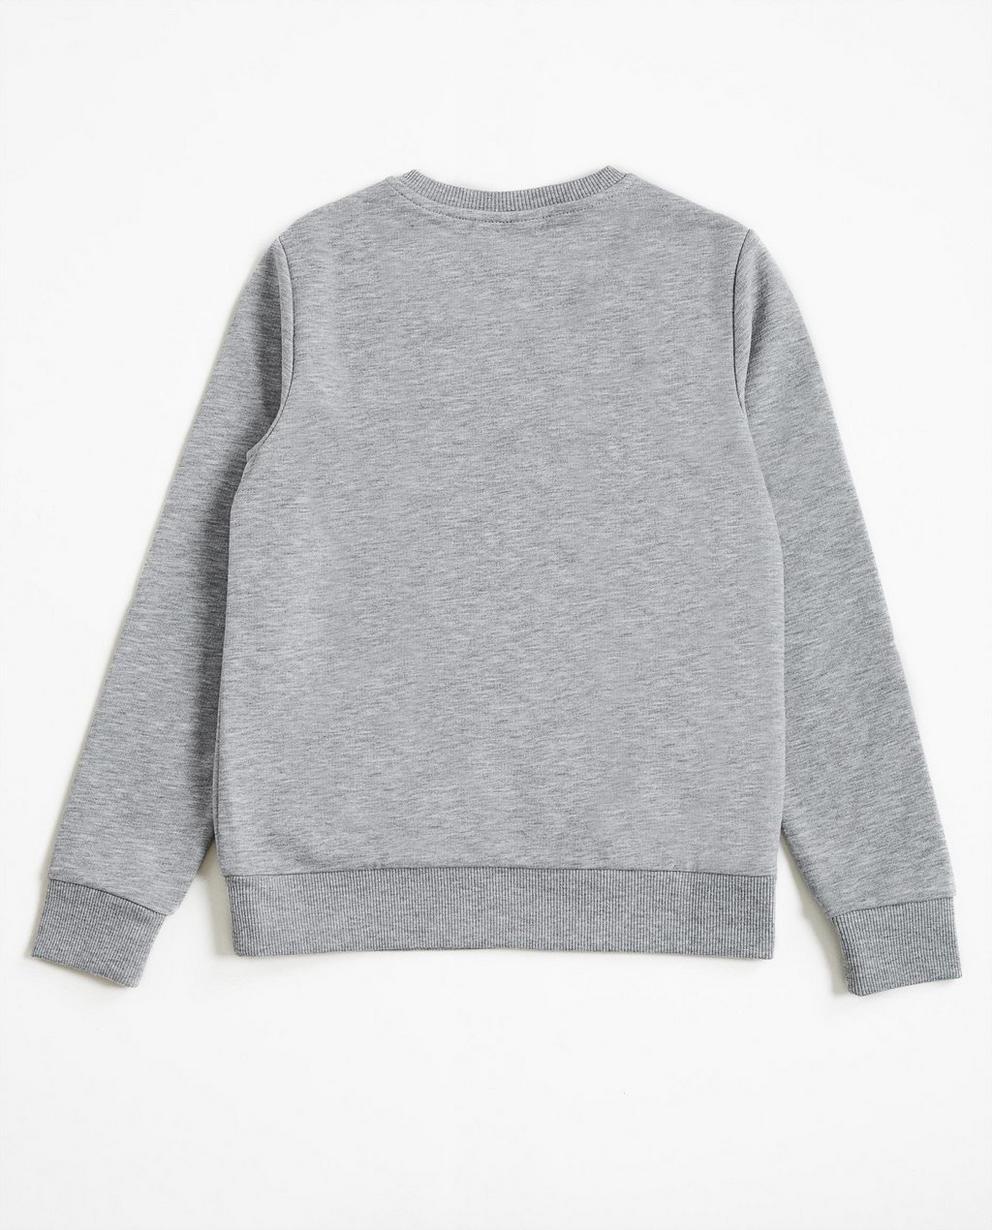 Sweater - Blassgrau -